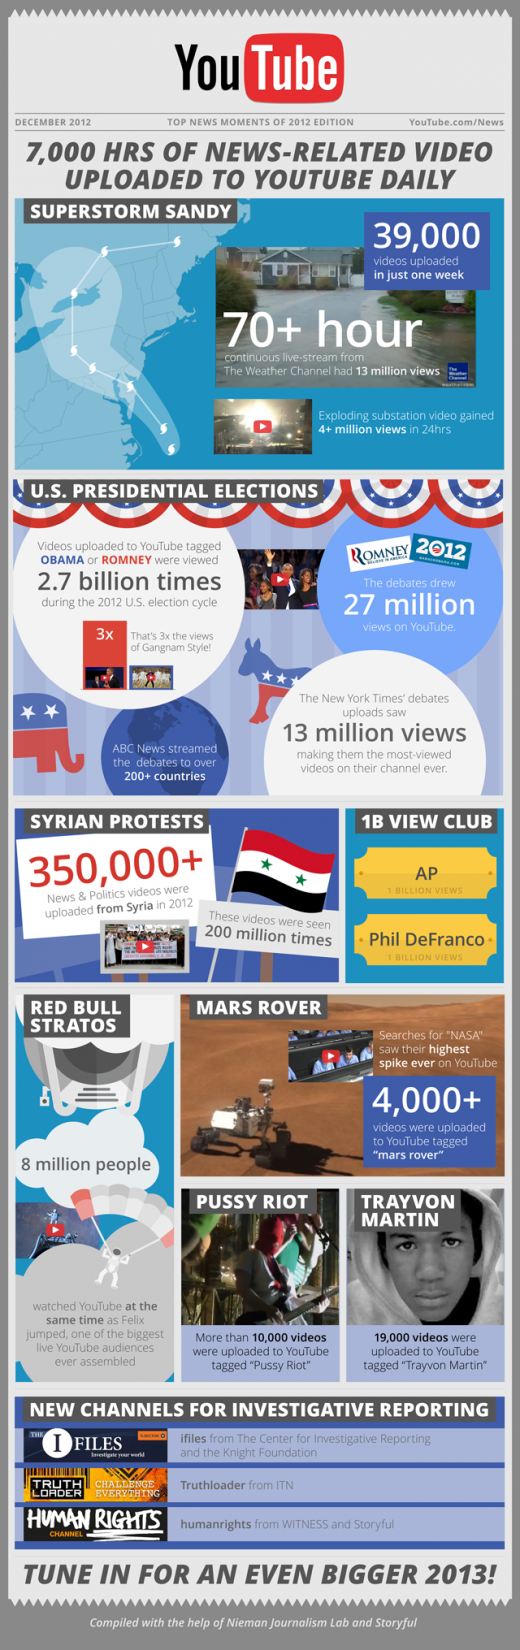 YouTube News infographic